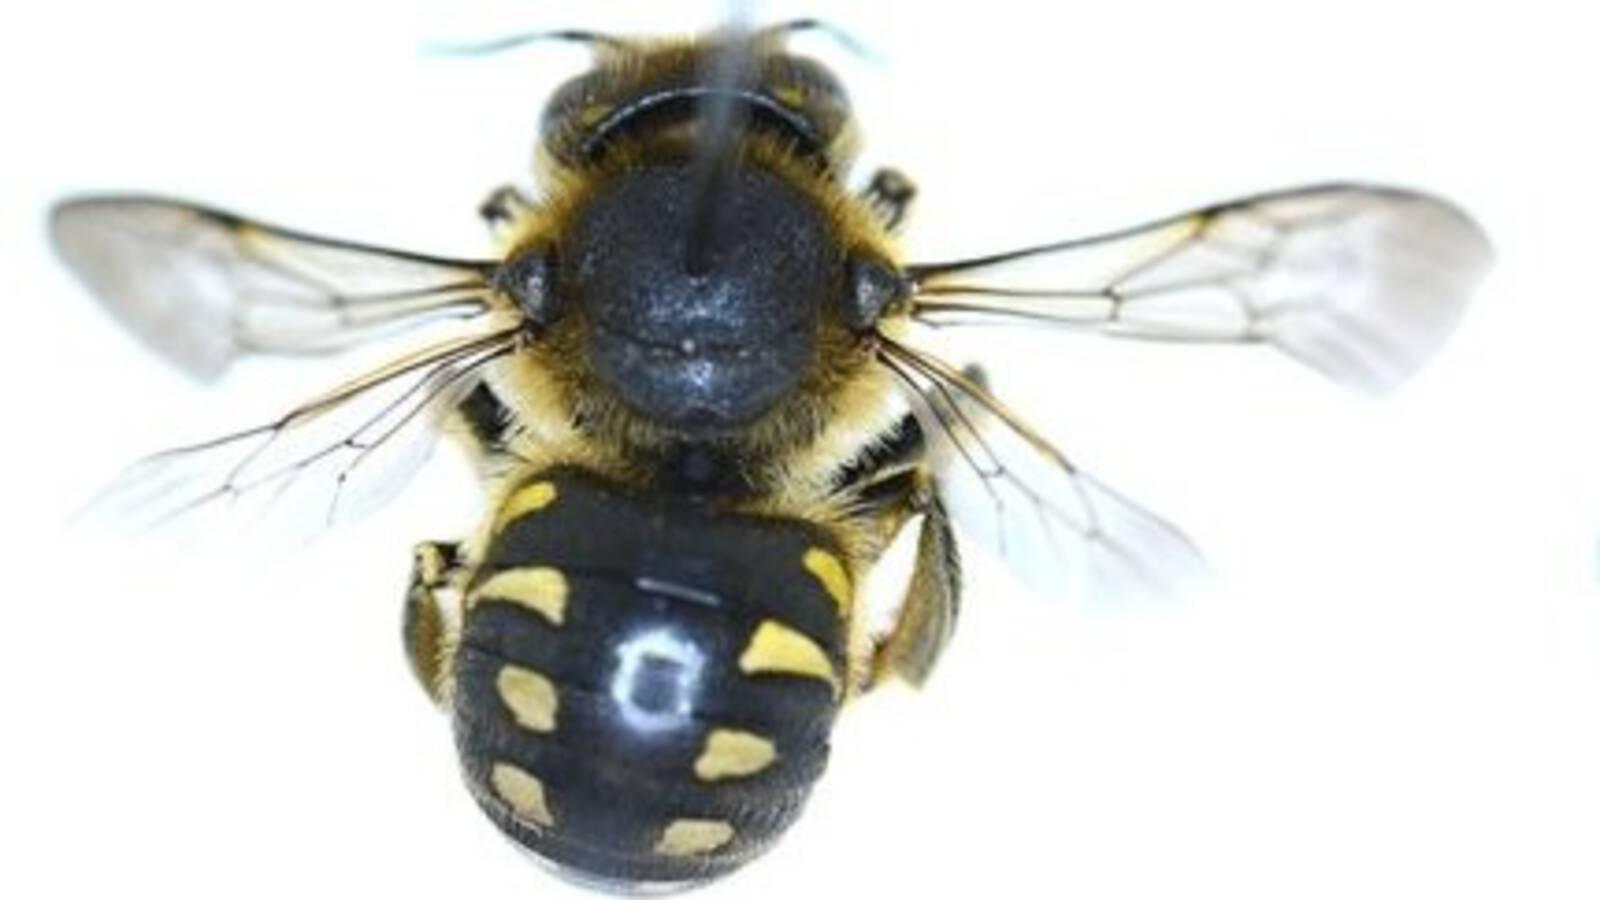 Anthidium septemspinosum bee, photo by Theo Zeegers